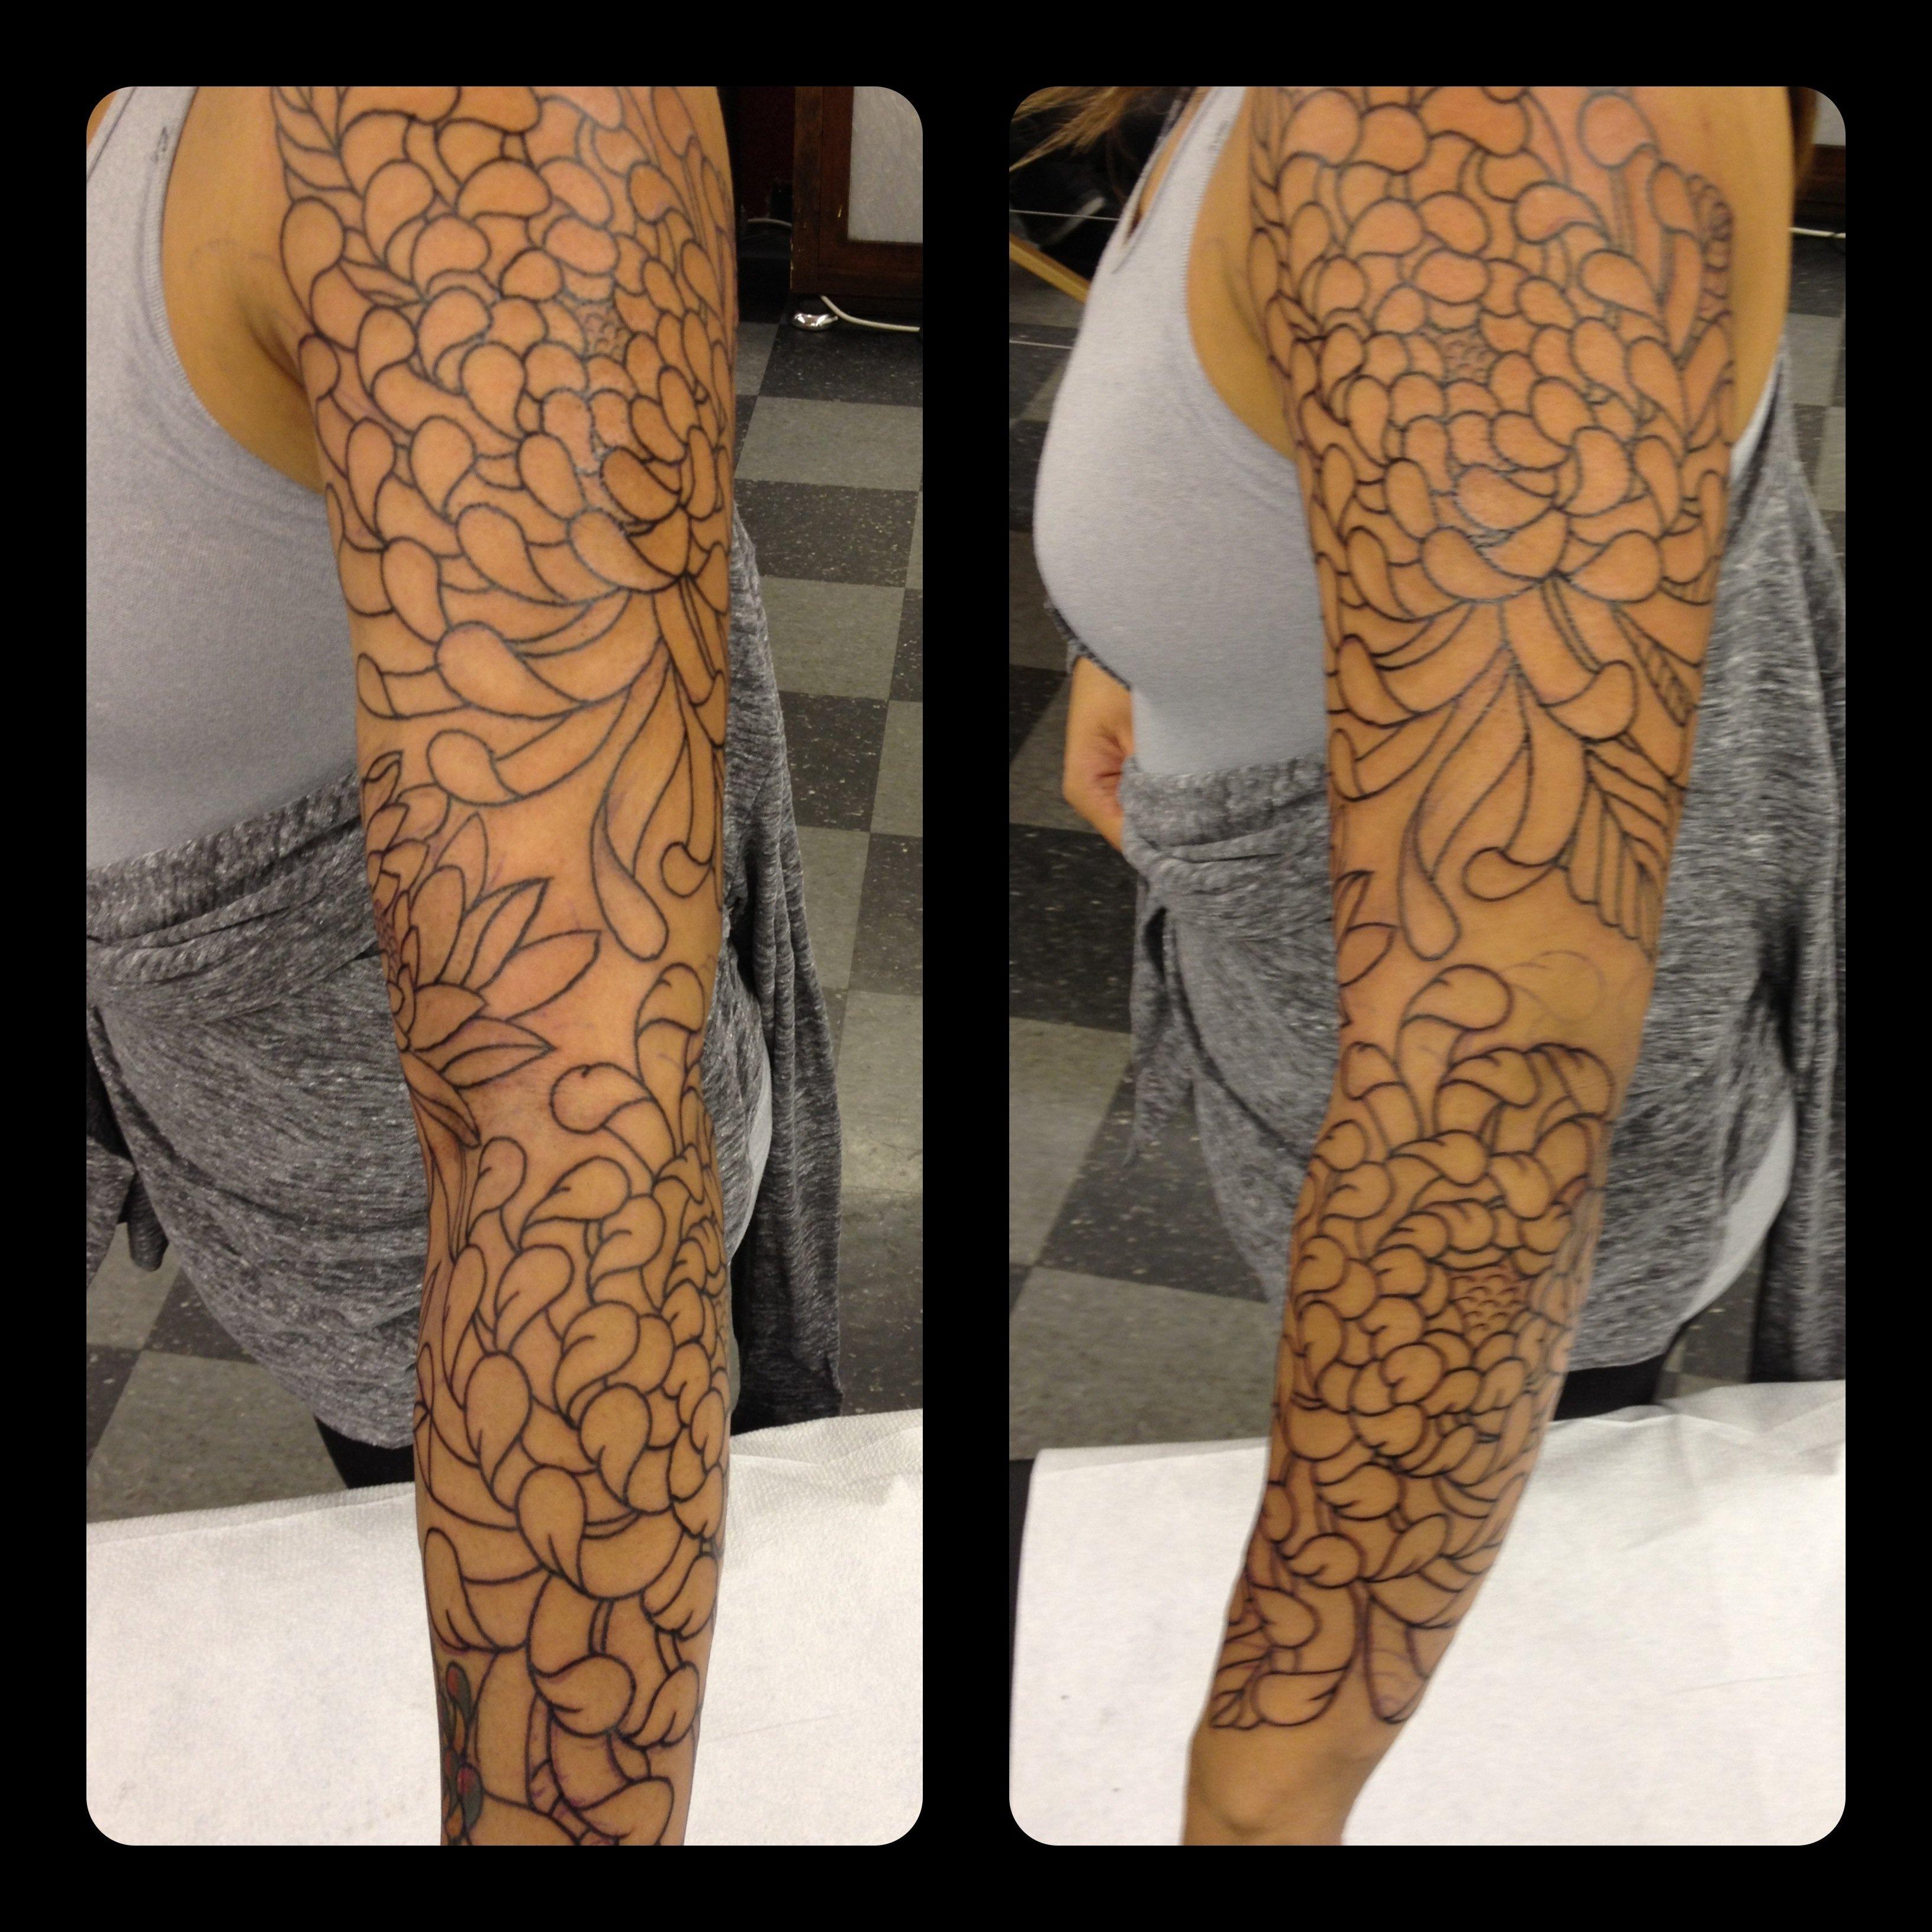 tattoo sleeve filler